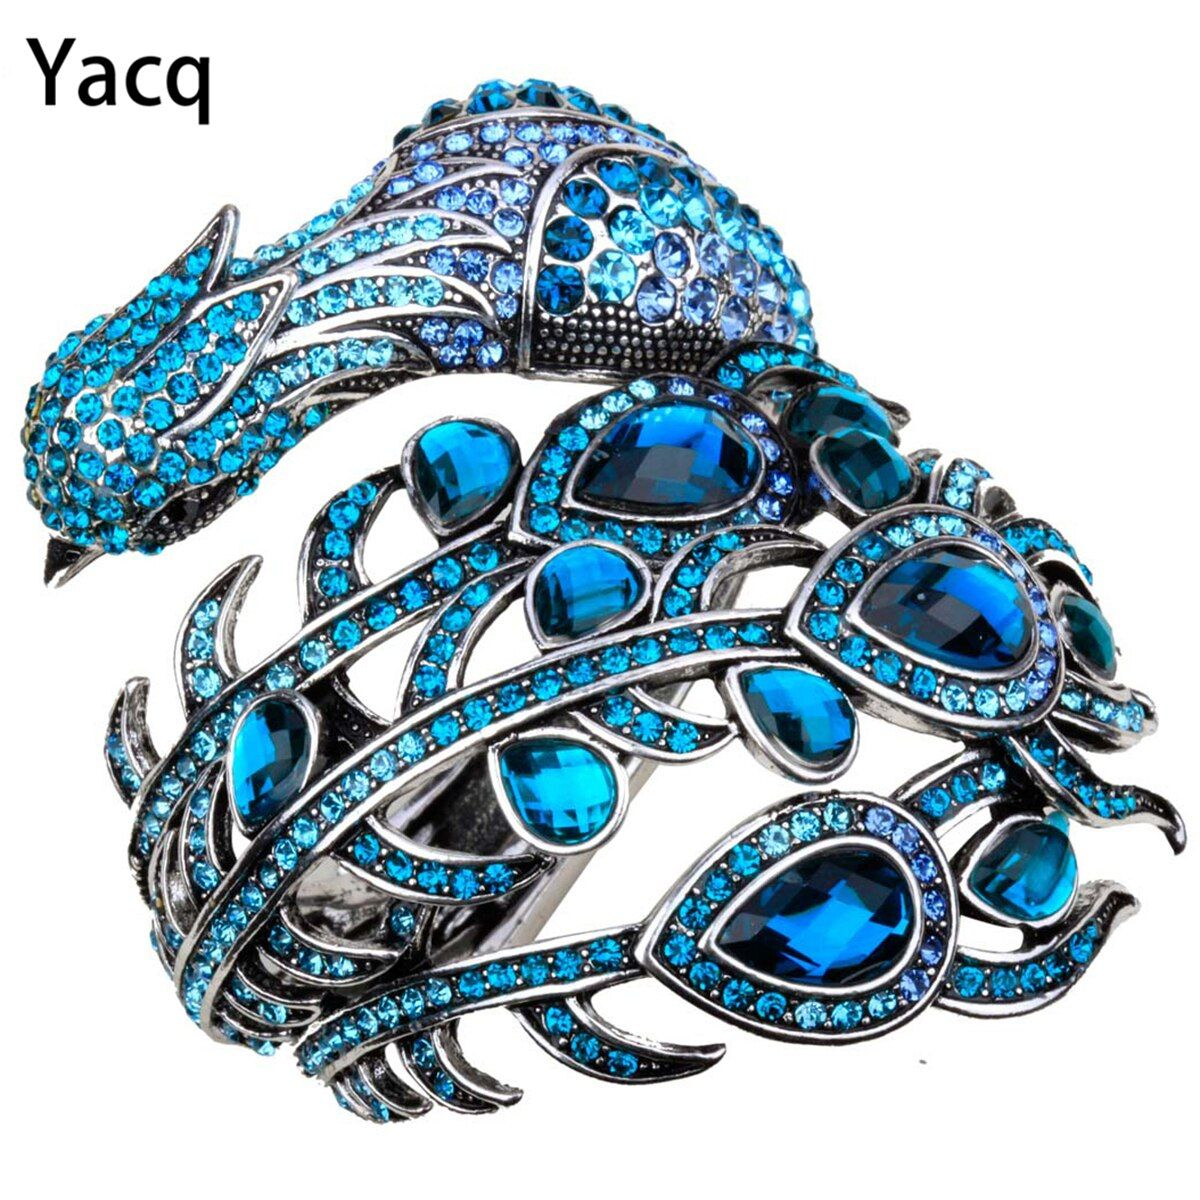 YACQ Peacock <font><b>Bracelet</b></font> Women Crystal Bangle Cuff Punk Rock Fashion Jewelry Gifts for Girlfriend Wife Her Mom A29 Dropshipping